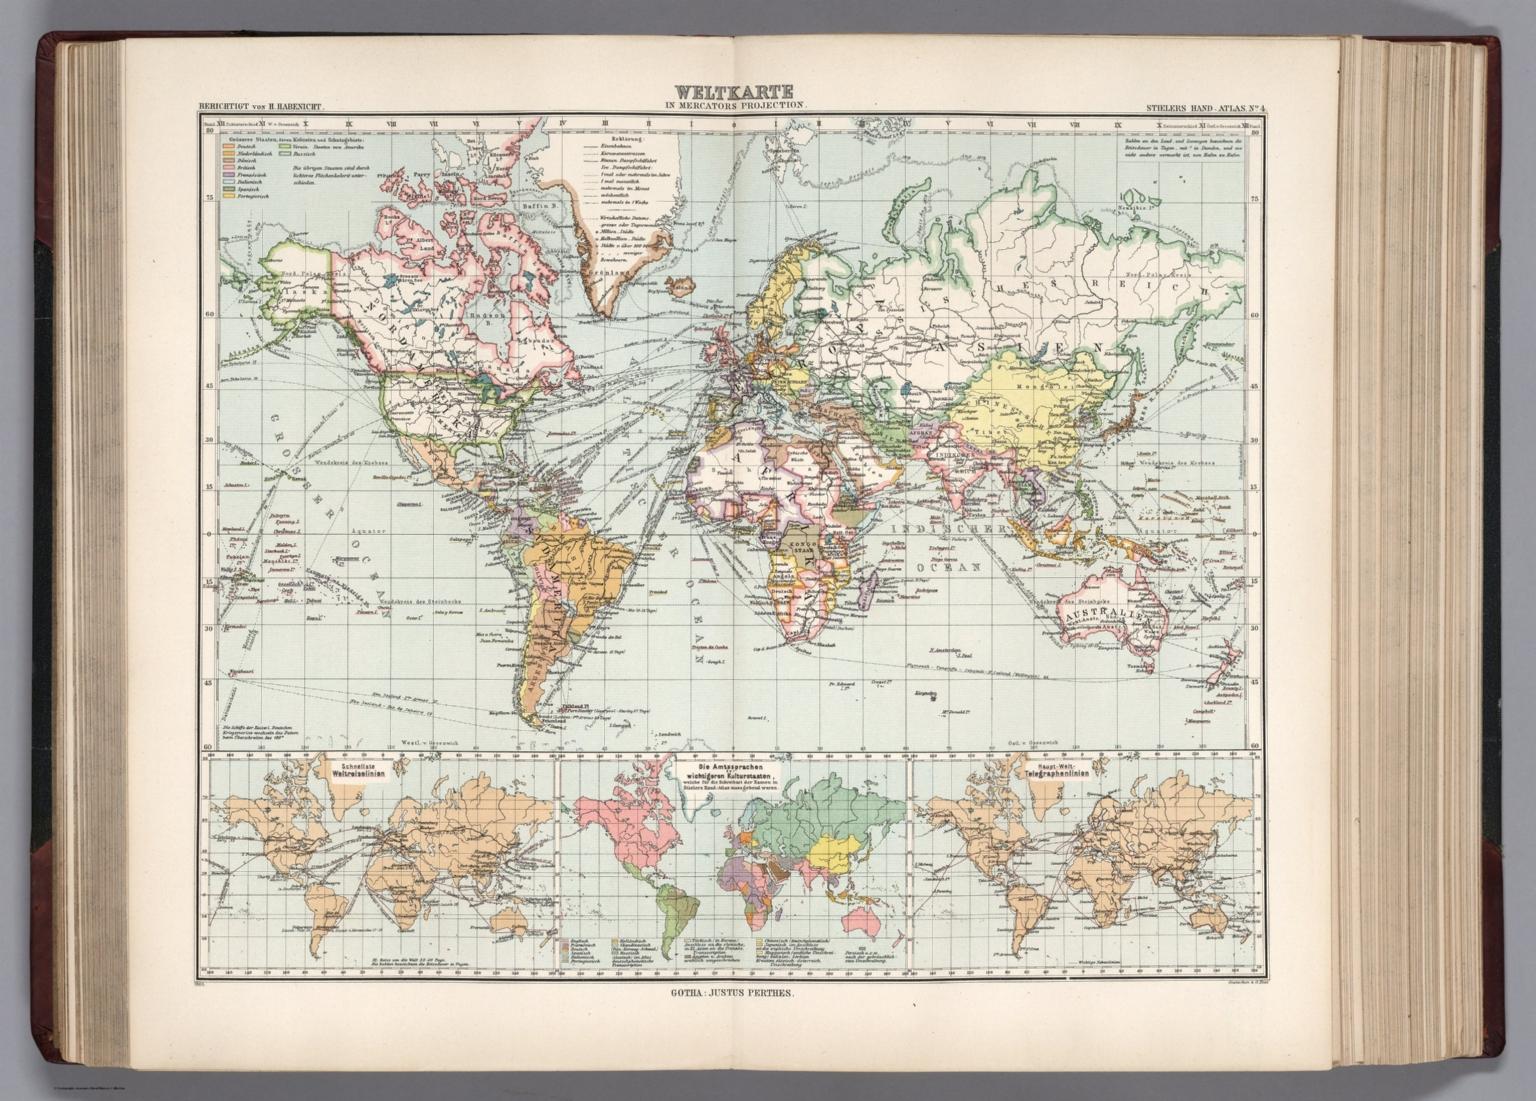 4 Weltkarte In Mercators Projektion David Rumsey Historical